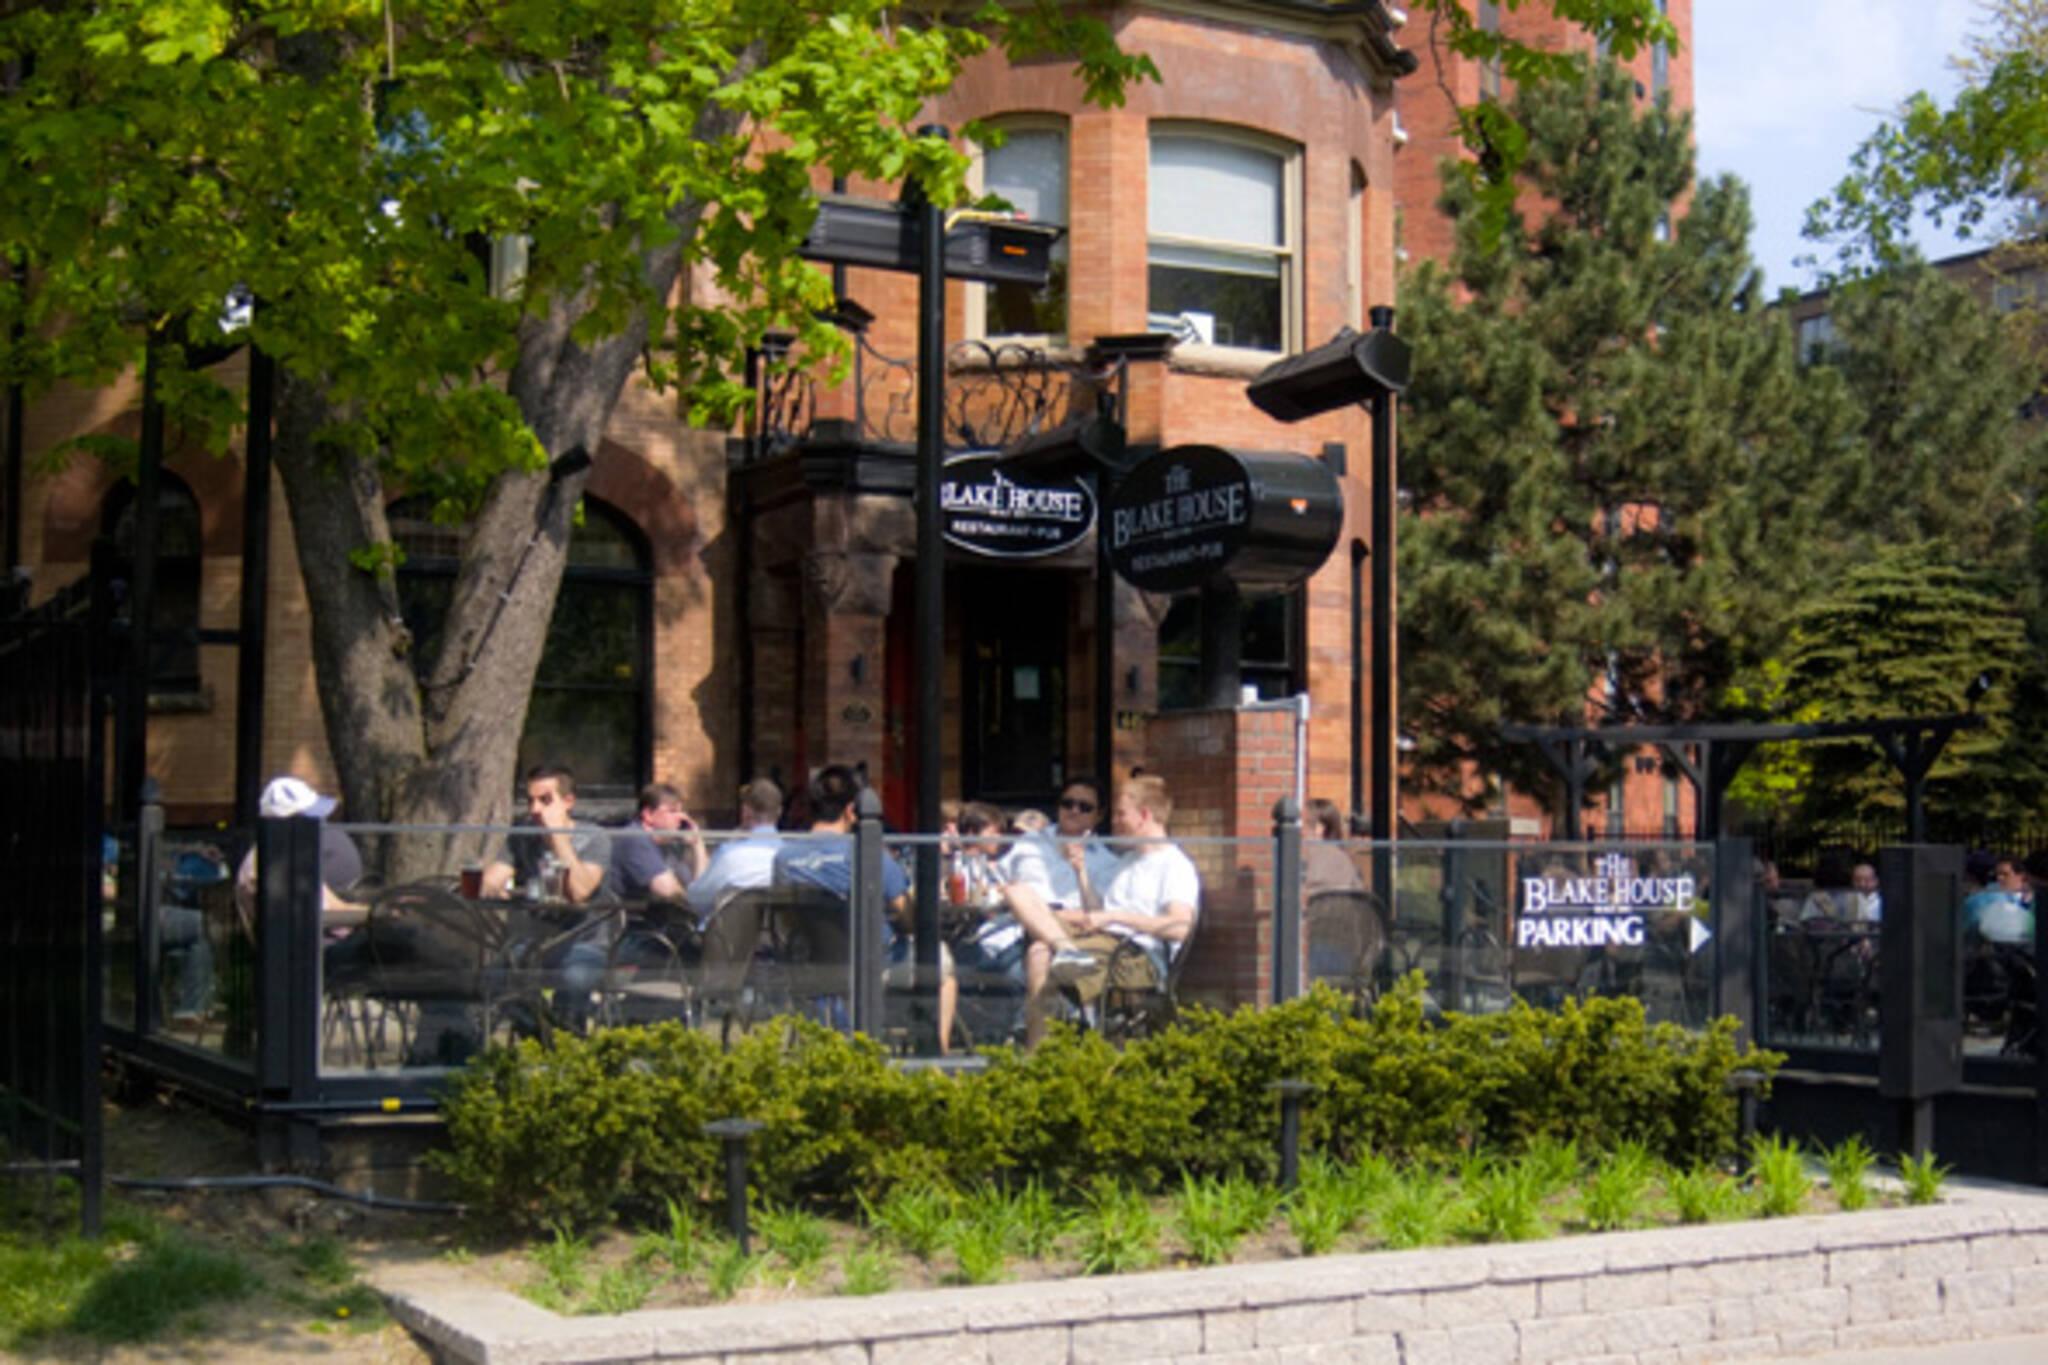 Blake House Toronto